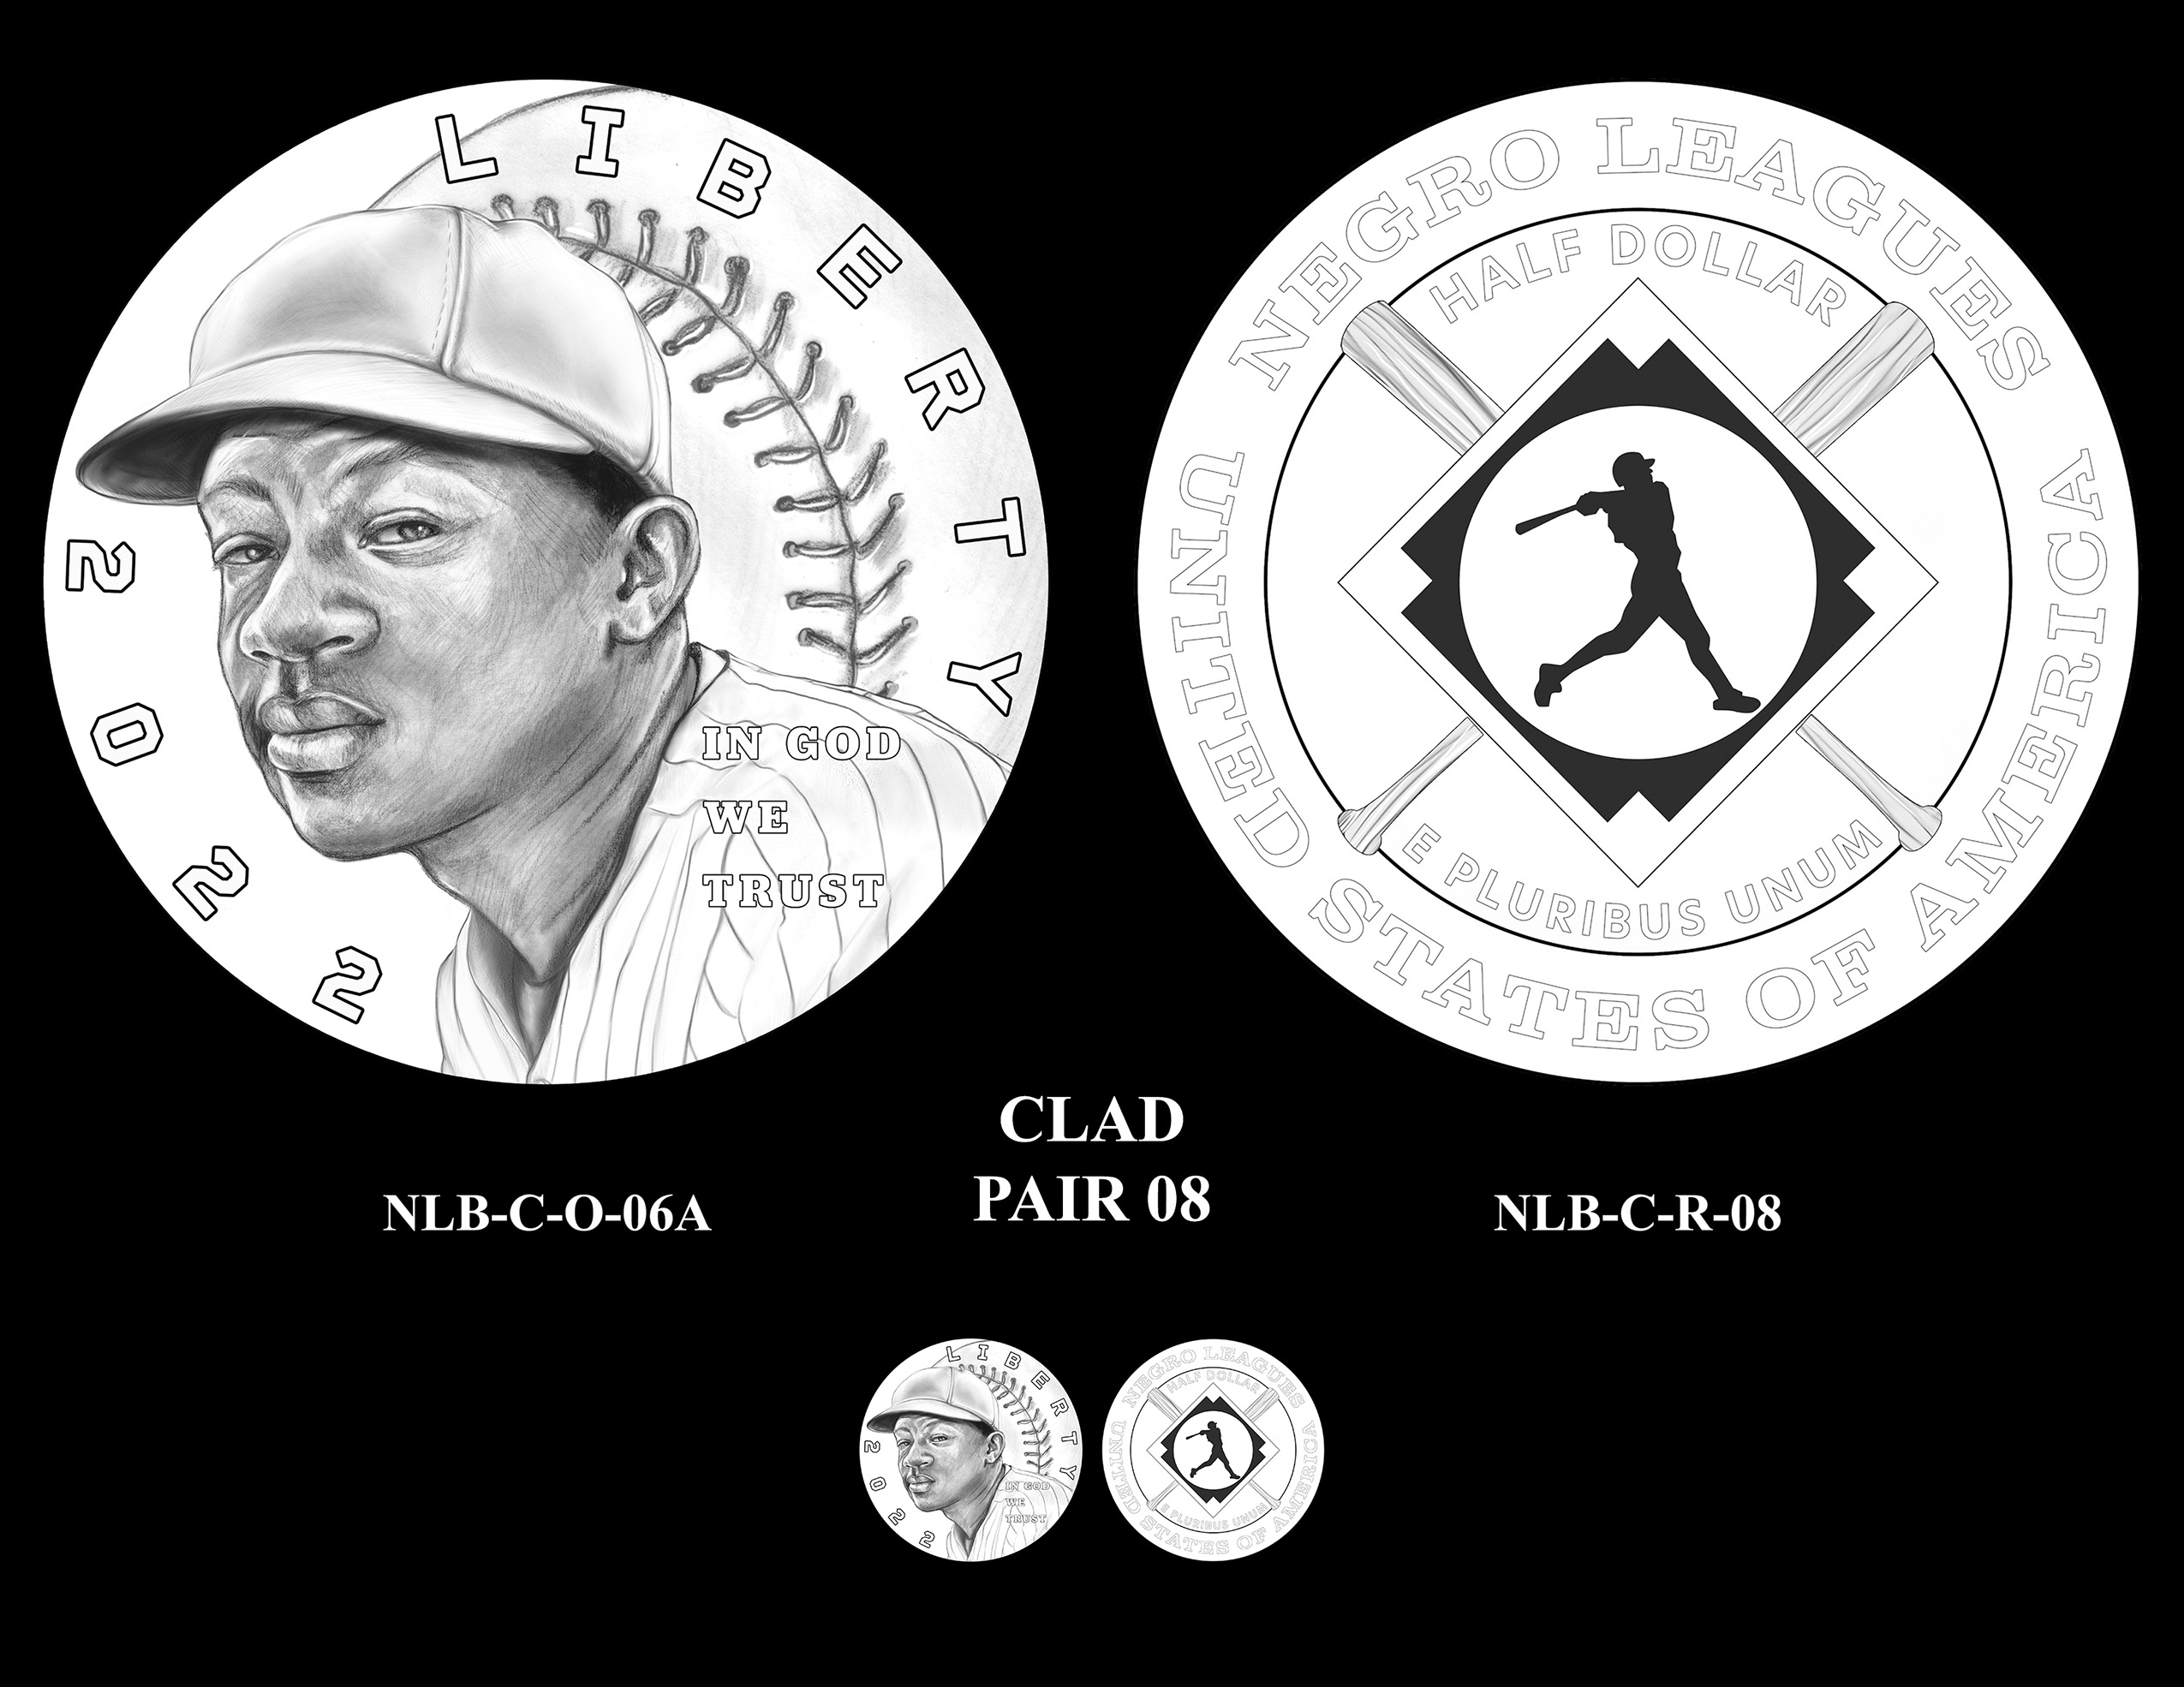 Clad Pair 08 -- Negro Leagues Baseball Commemorative Coin Program